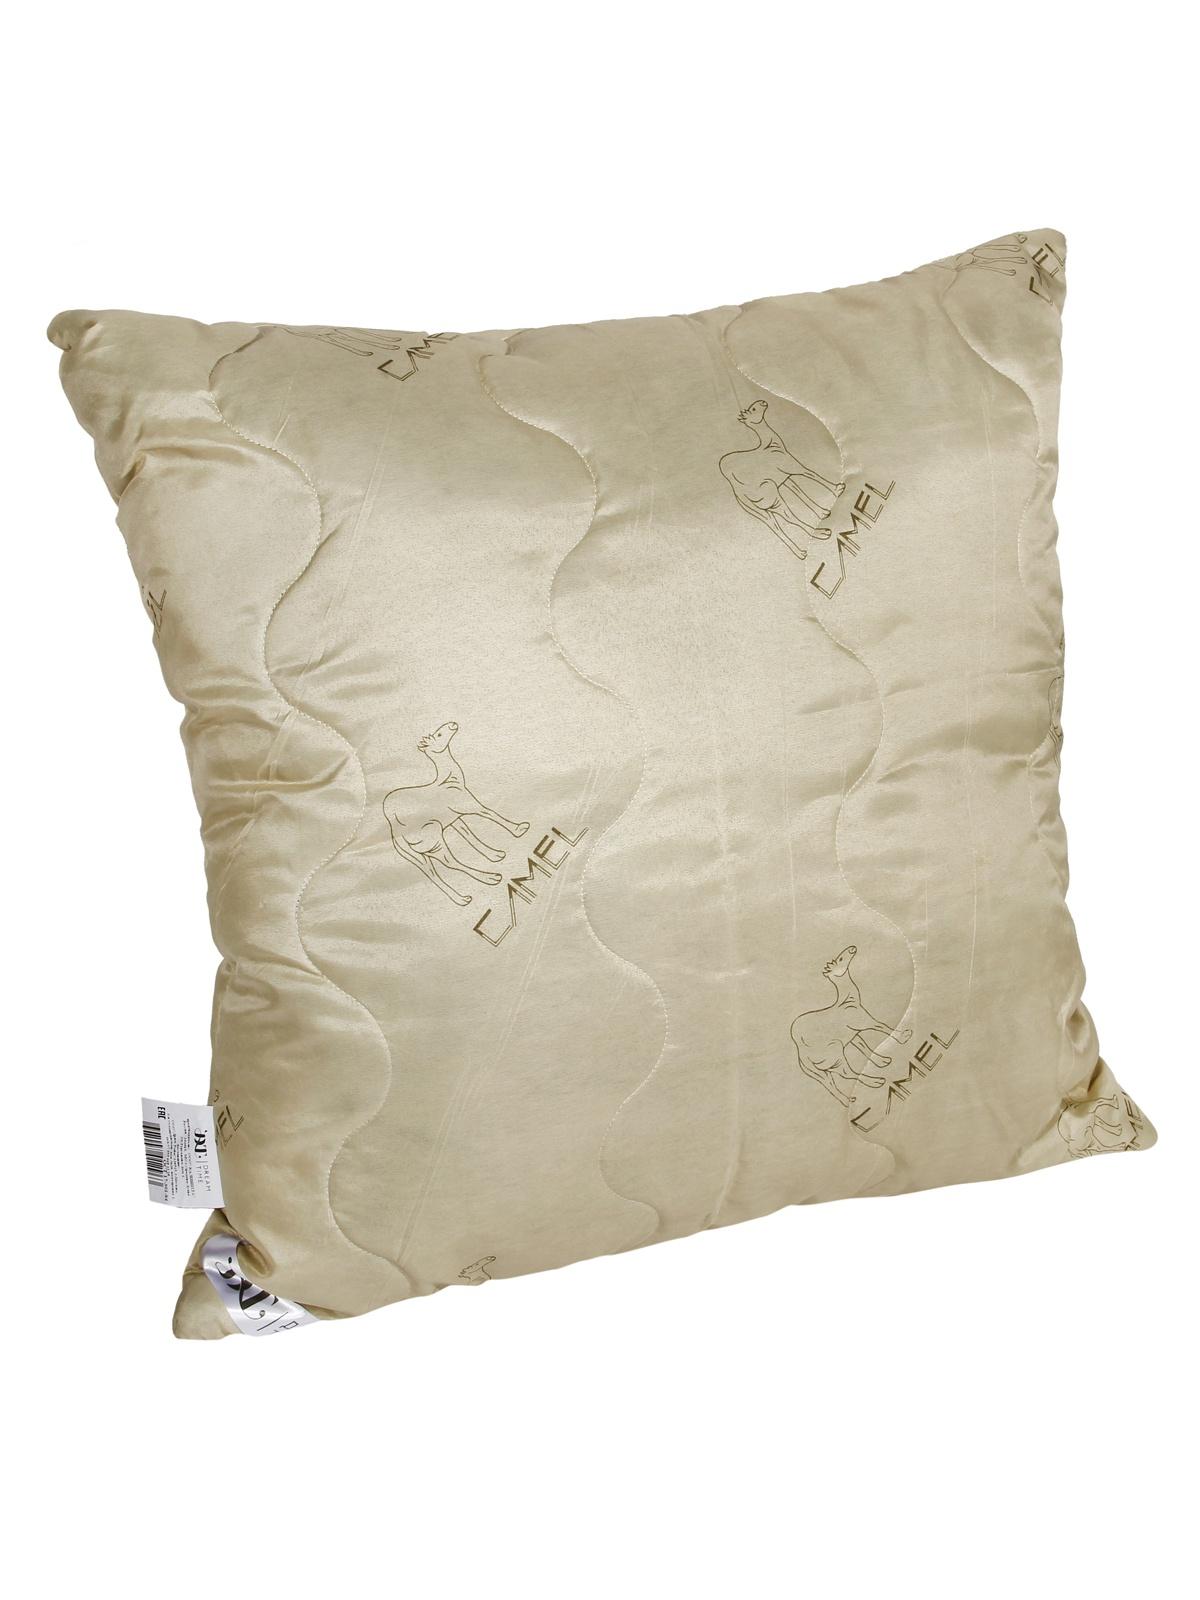 Подушка Dream Time, 471070-э, бежевый, 68 х 68 см подушка ecotex эдда наполнитель пух 68 х 68 см